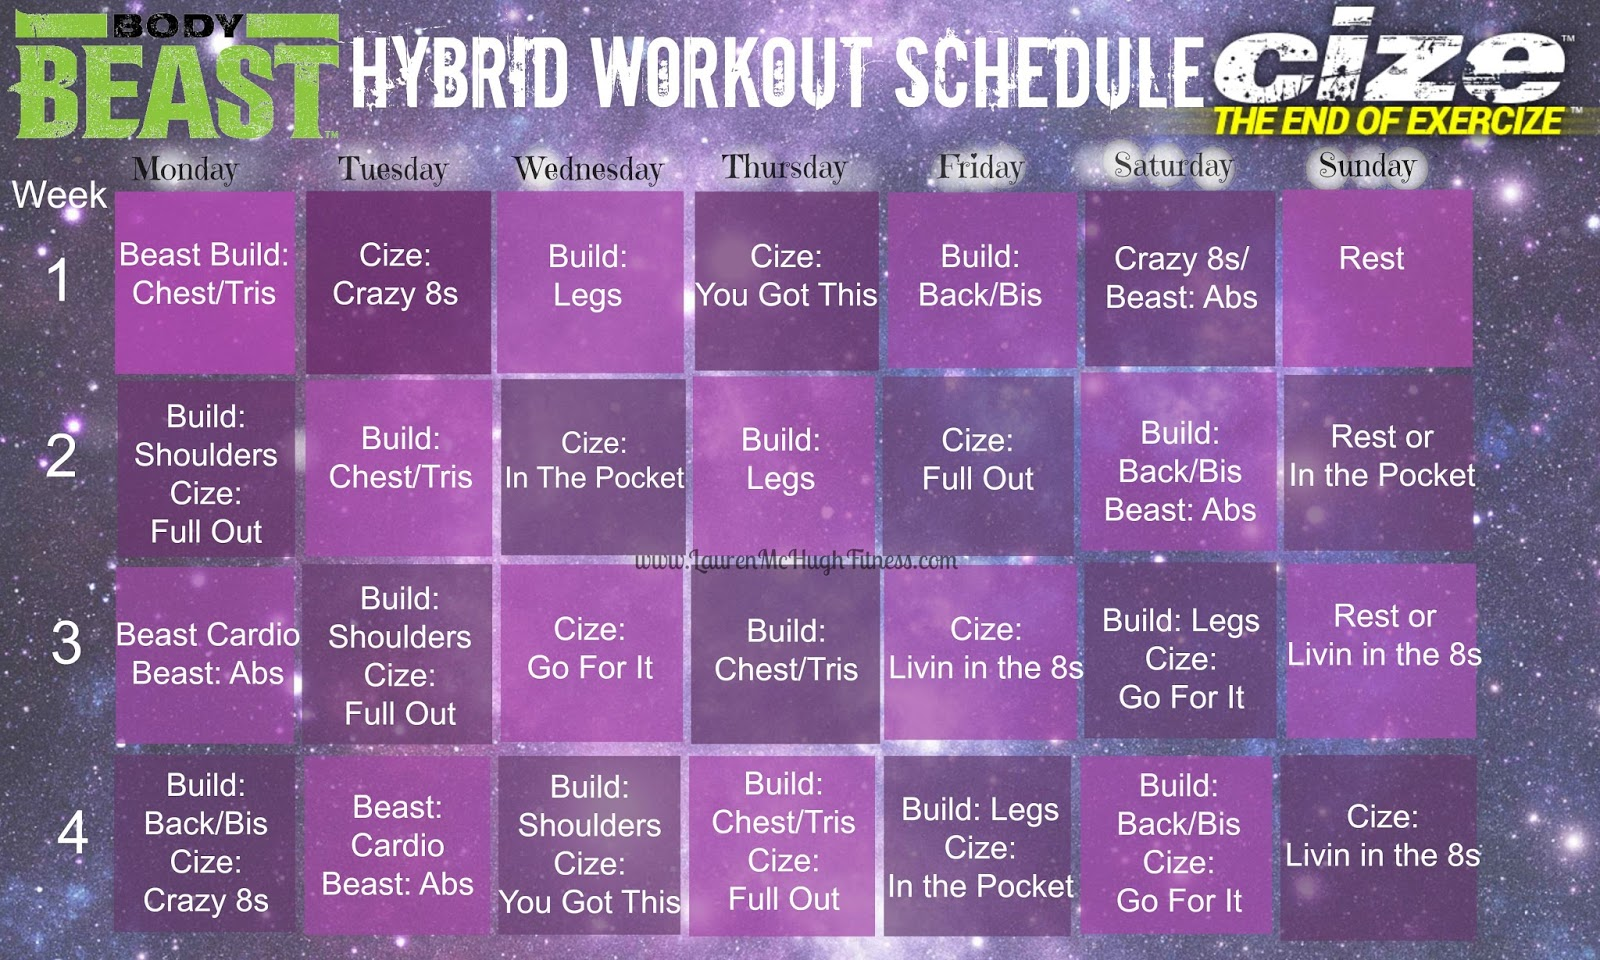 Body Beast And Cize Hybrid Workout Calendar